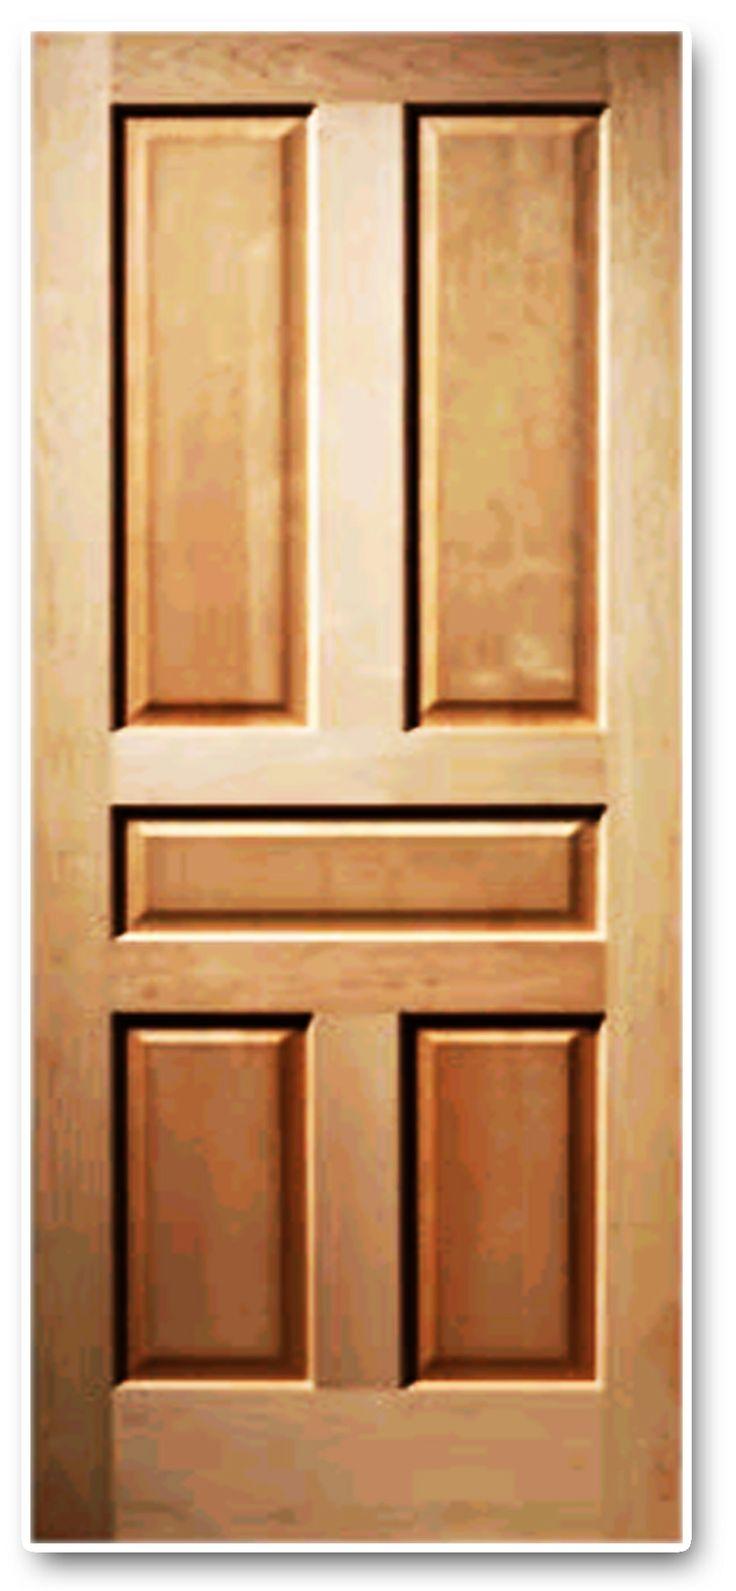 Puerta 5 tableros madera pino puertas doors pinterest - Tableros de pino ...